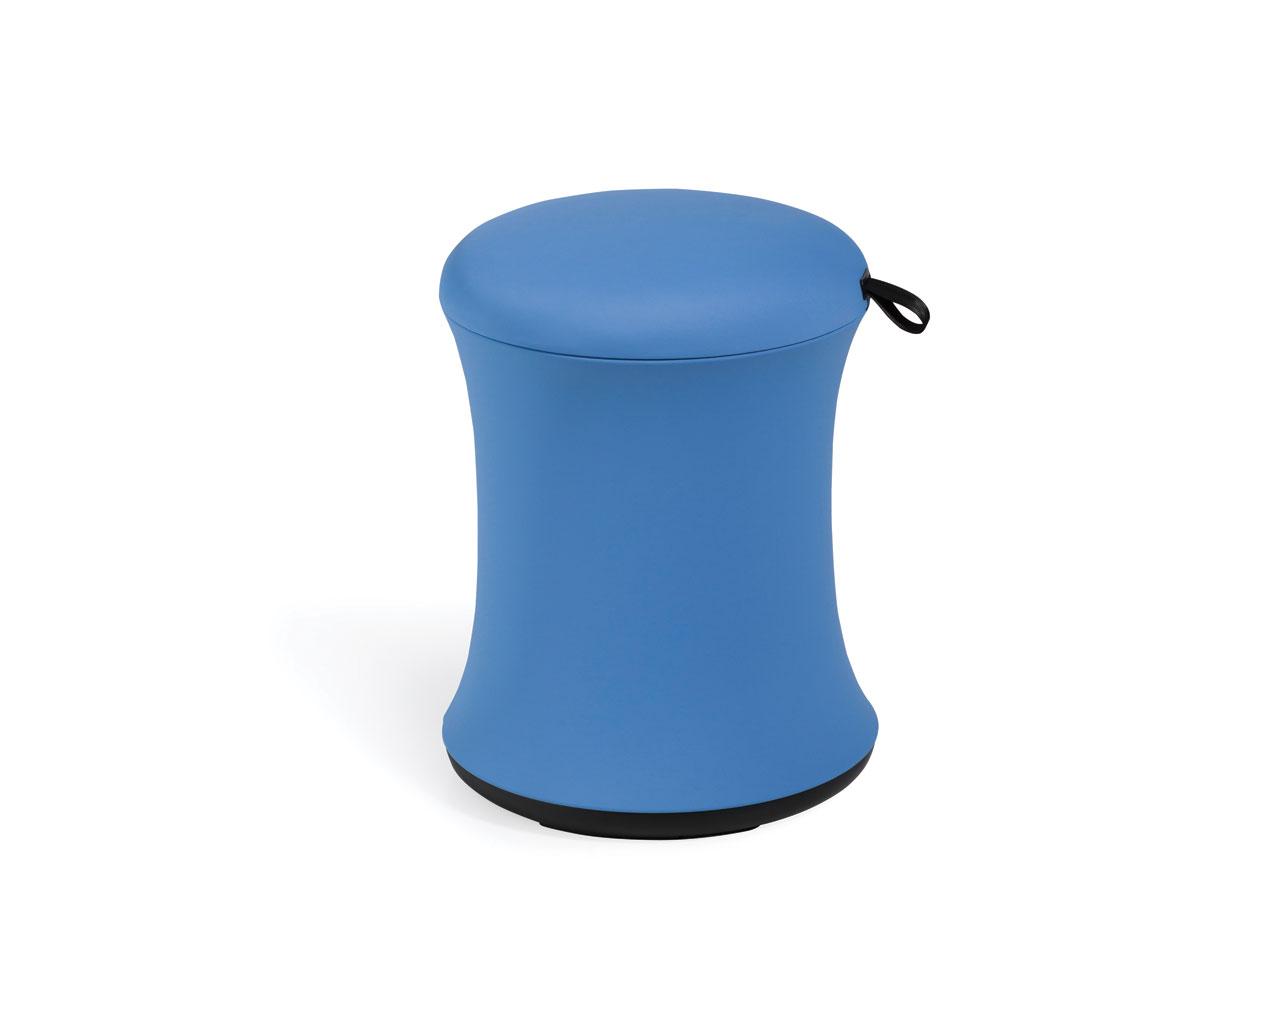 Blue office stool